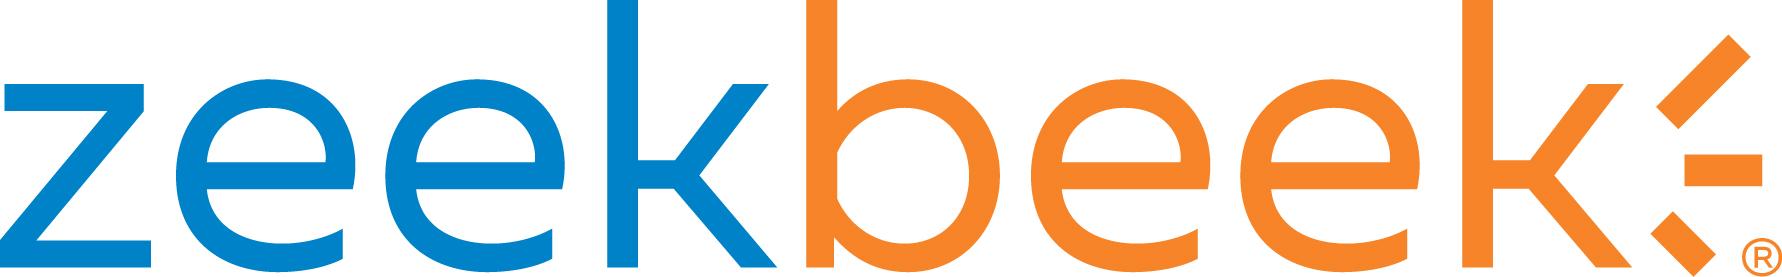 ZeekBeek/CloudLaw, Inc.